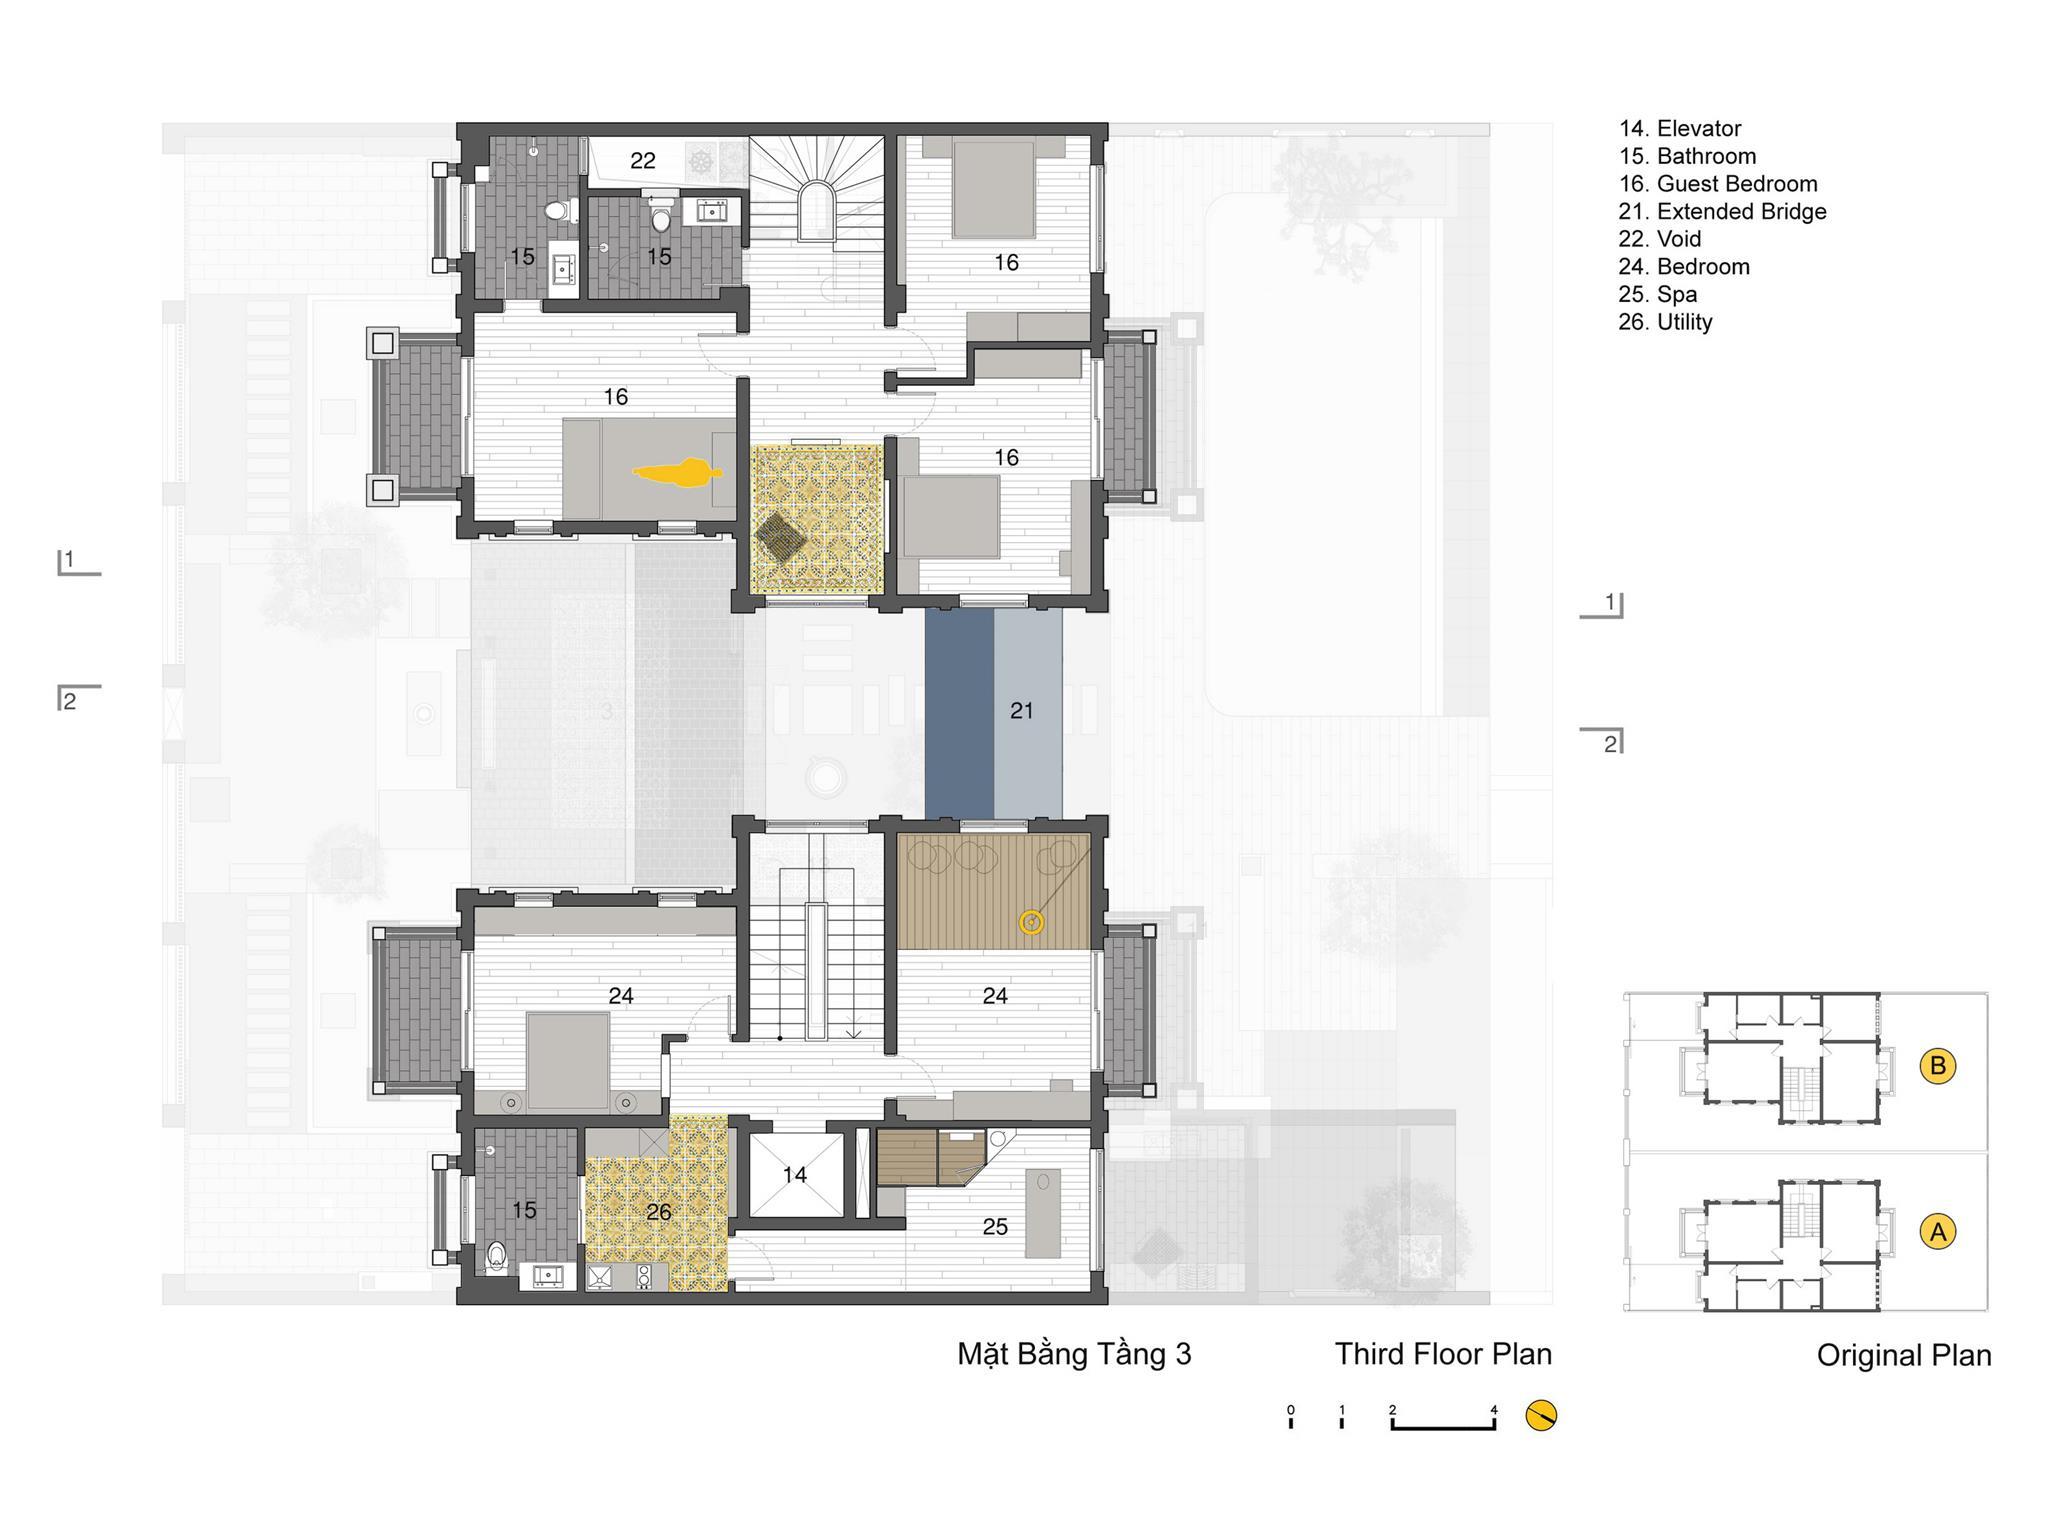 32-Third Floor Plan (Copy)